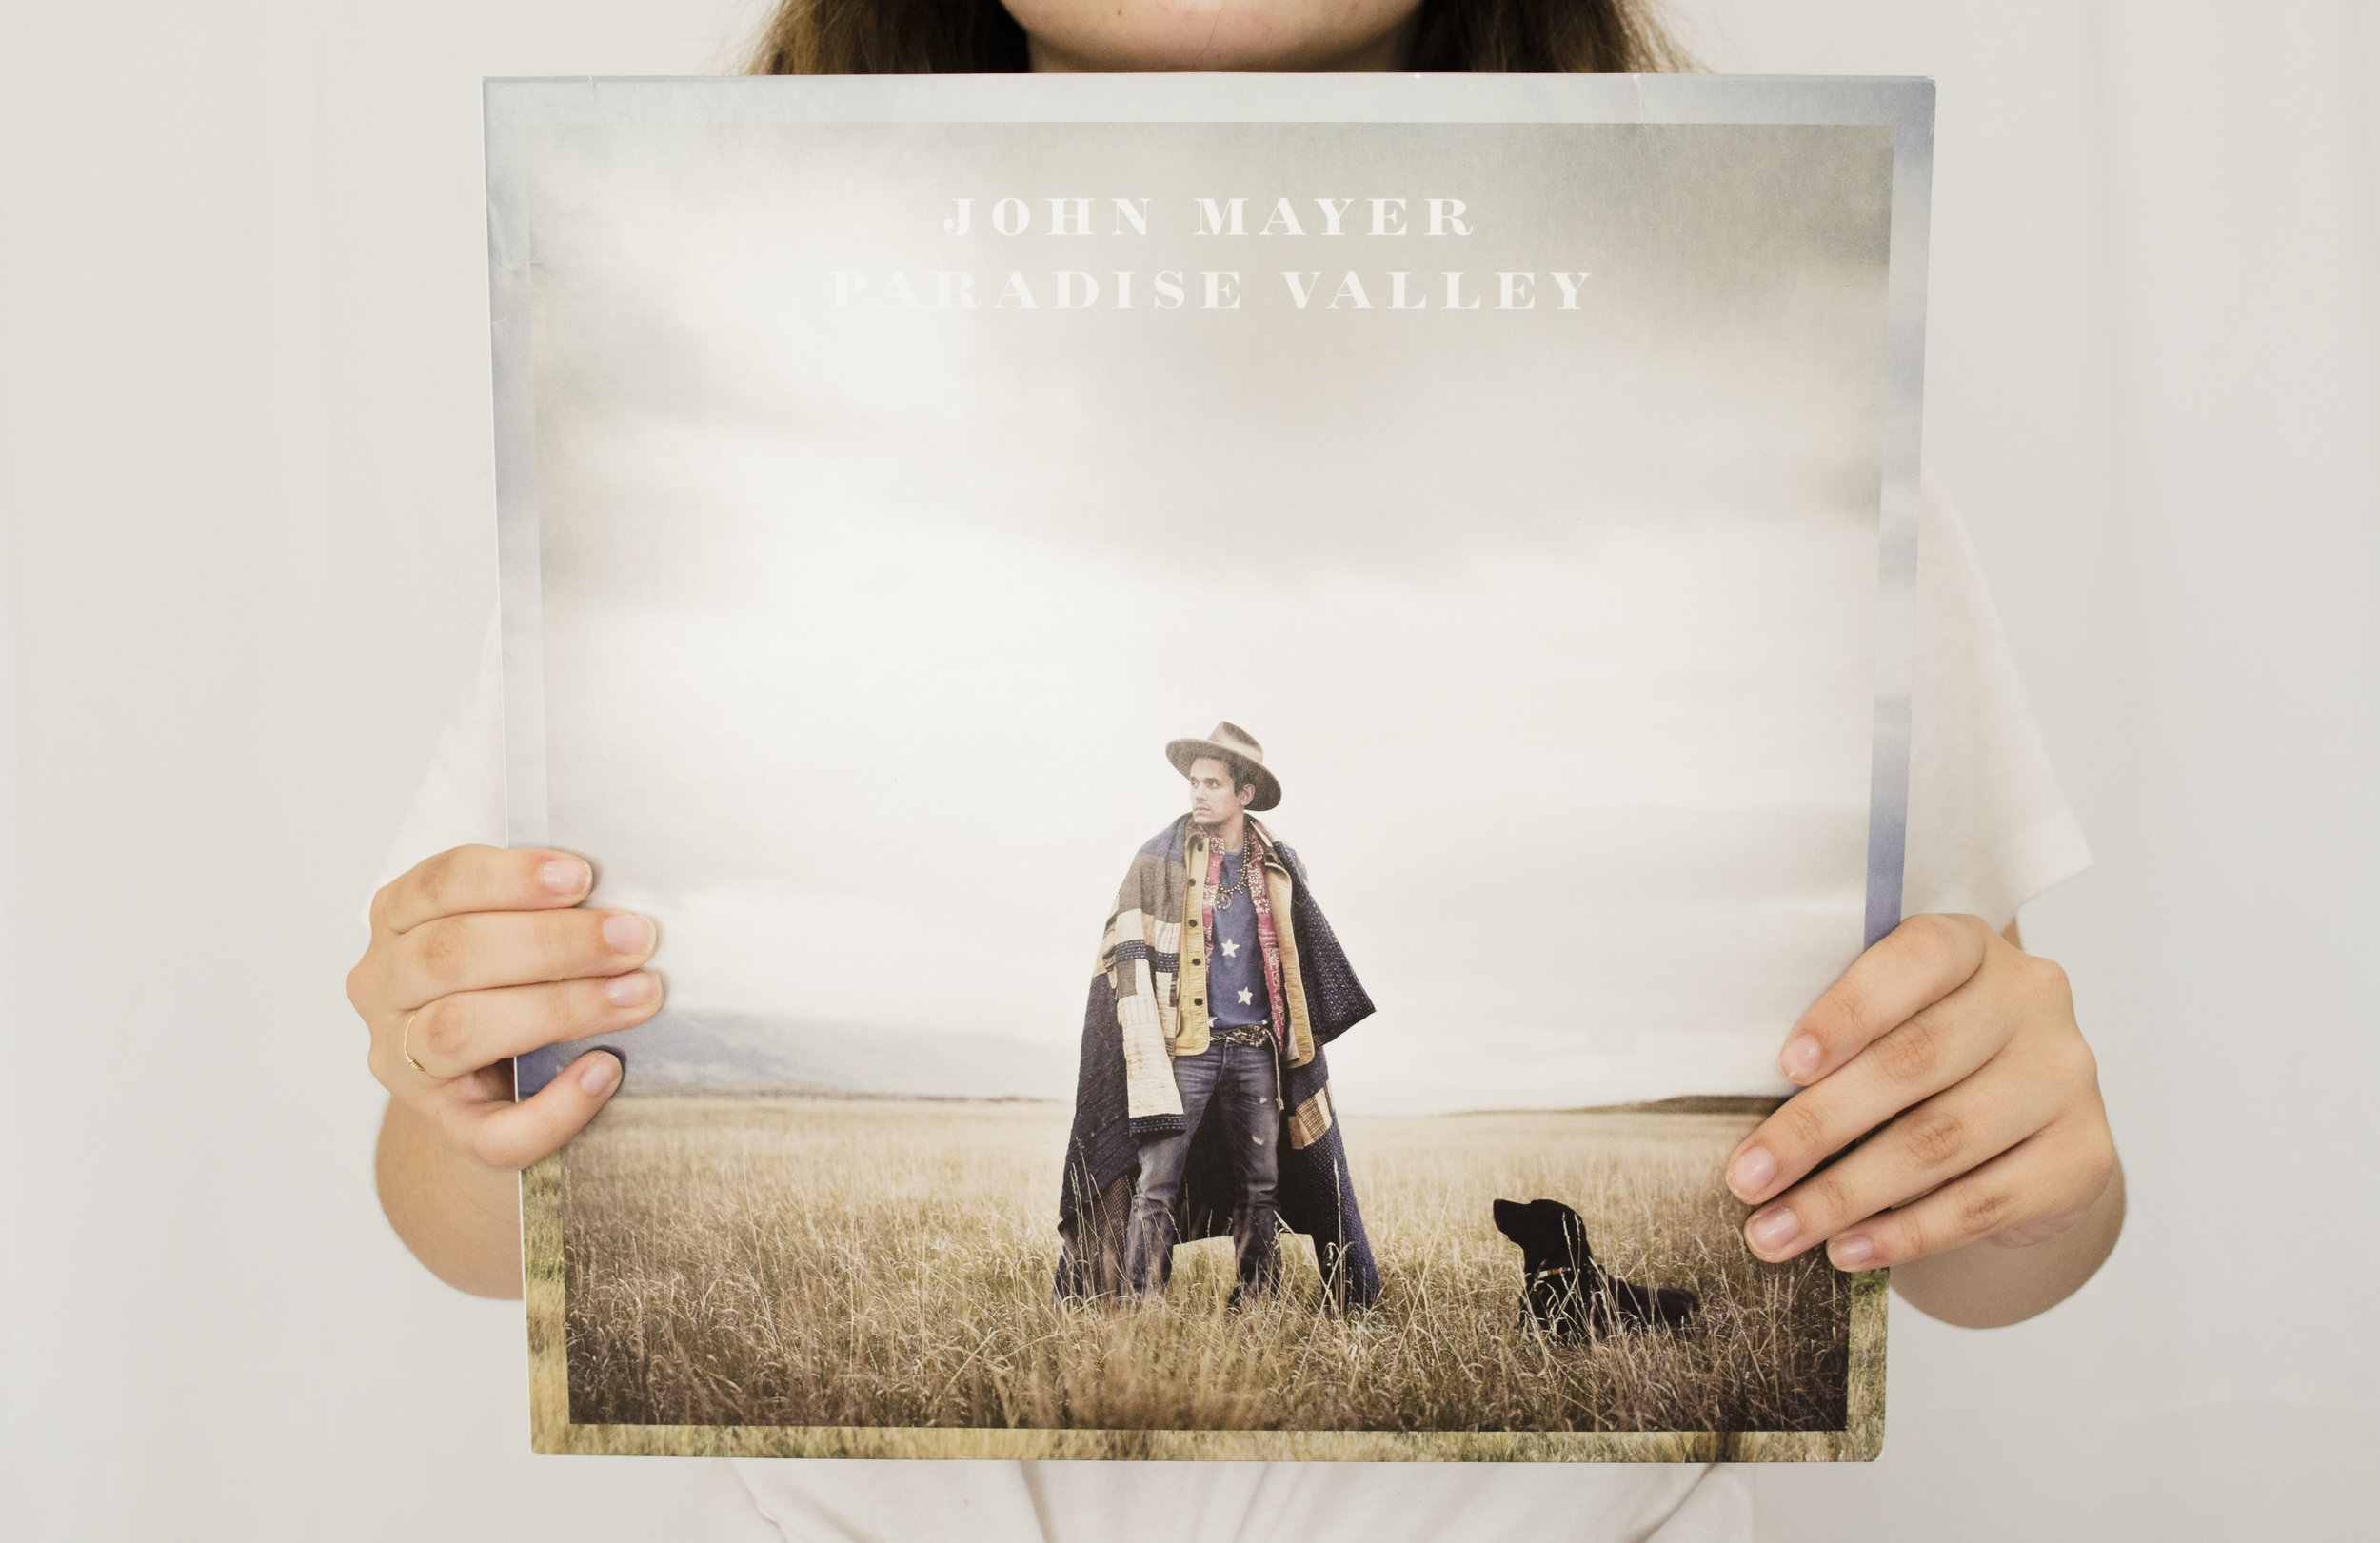 Paradise Valley  - by John Mayer